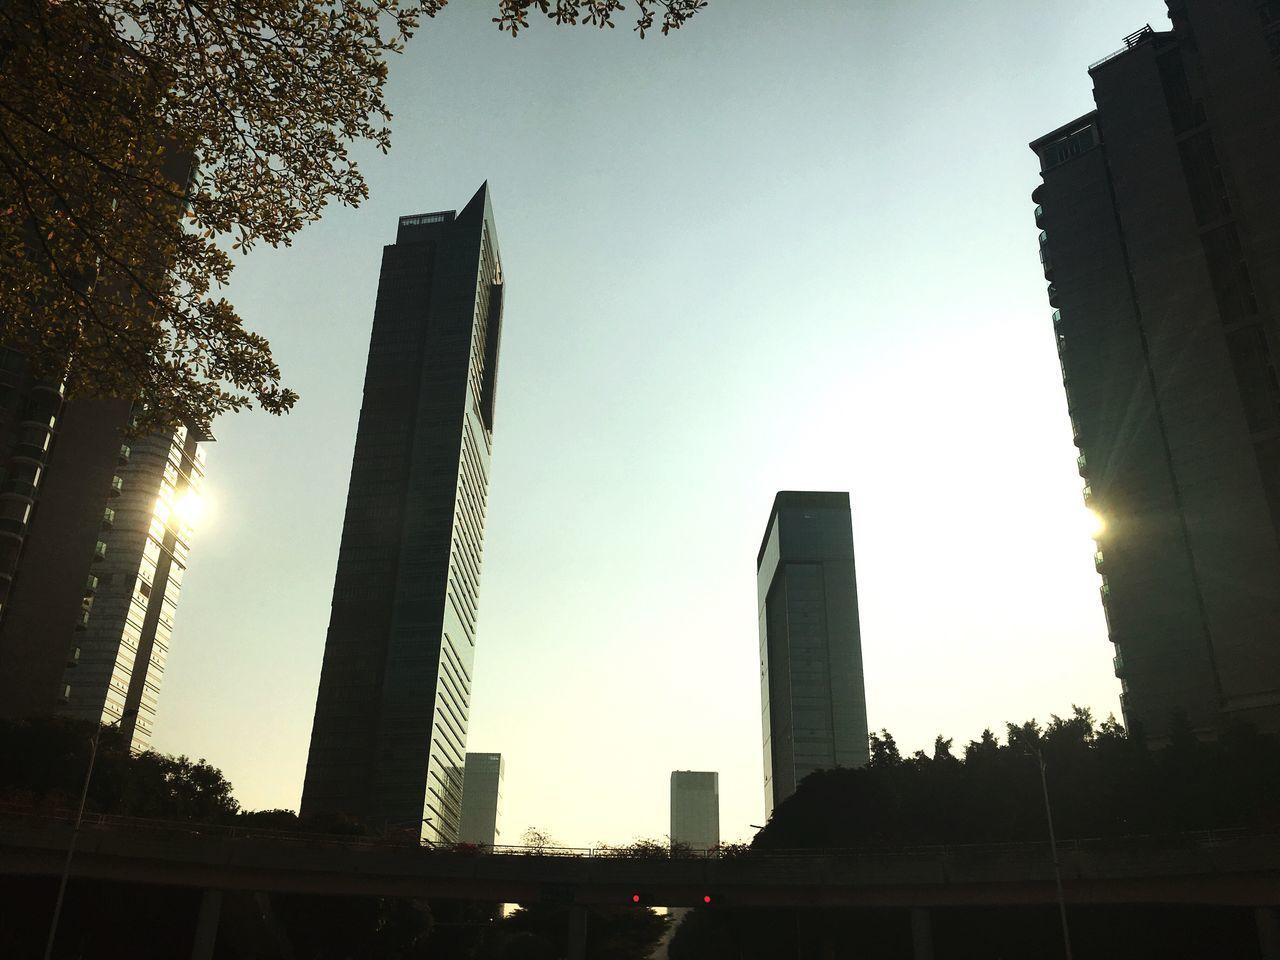 The City Light morning